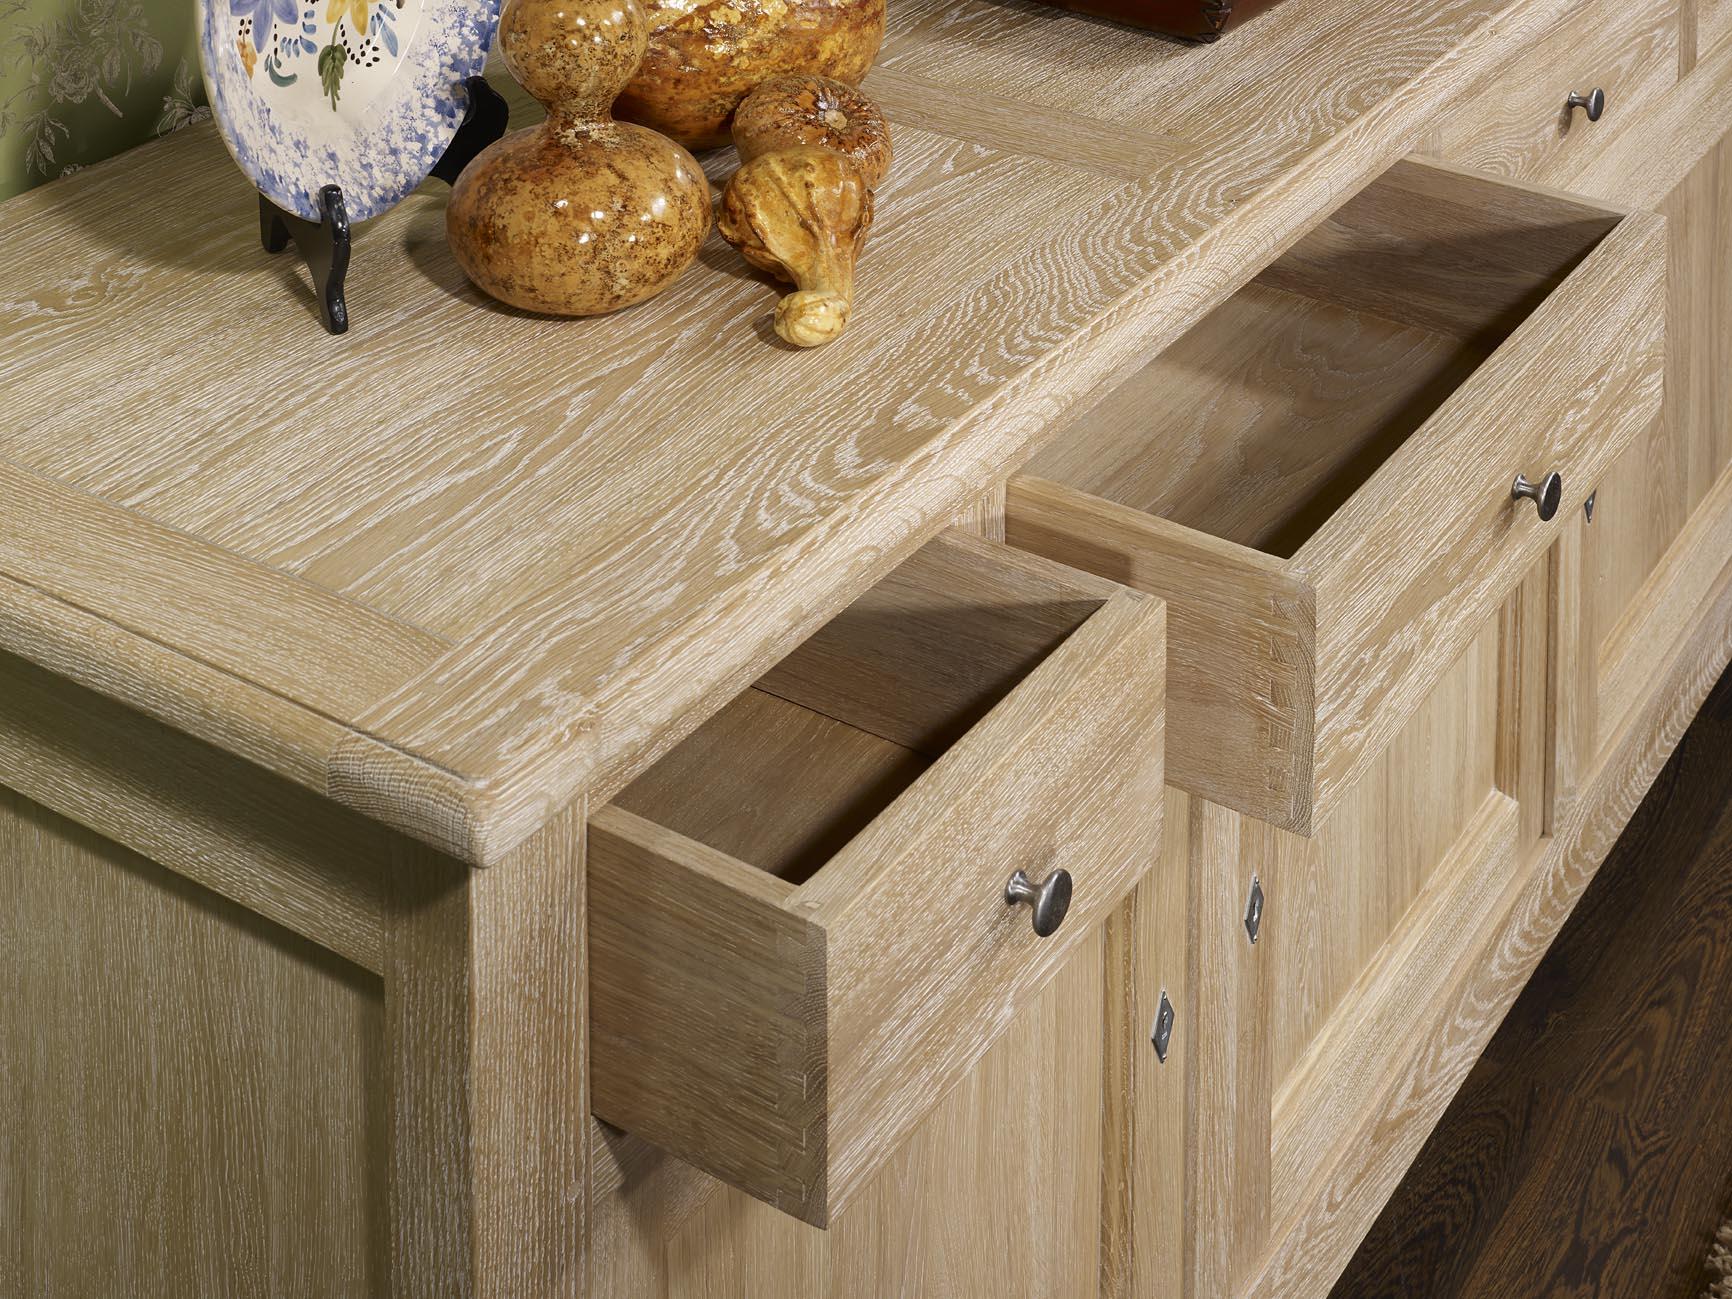 meuble en ch ne buffet nicolas r alis en ch ne massif de style campagnard 3 portes 4 tiroirs. Black Bedroom Furniture Sets. Home Design Ideas